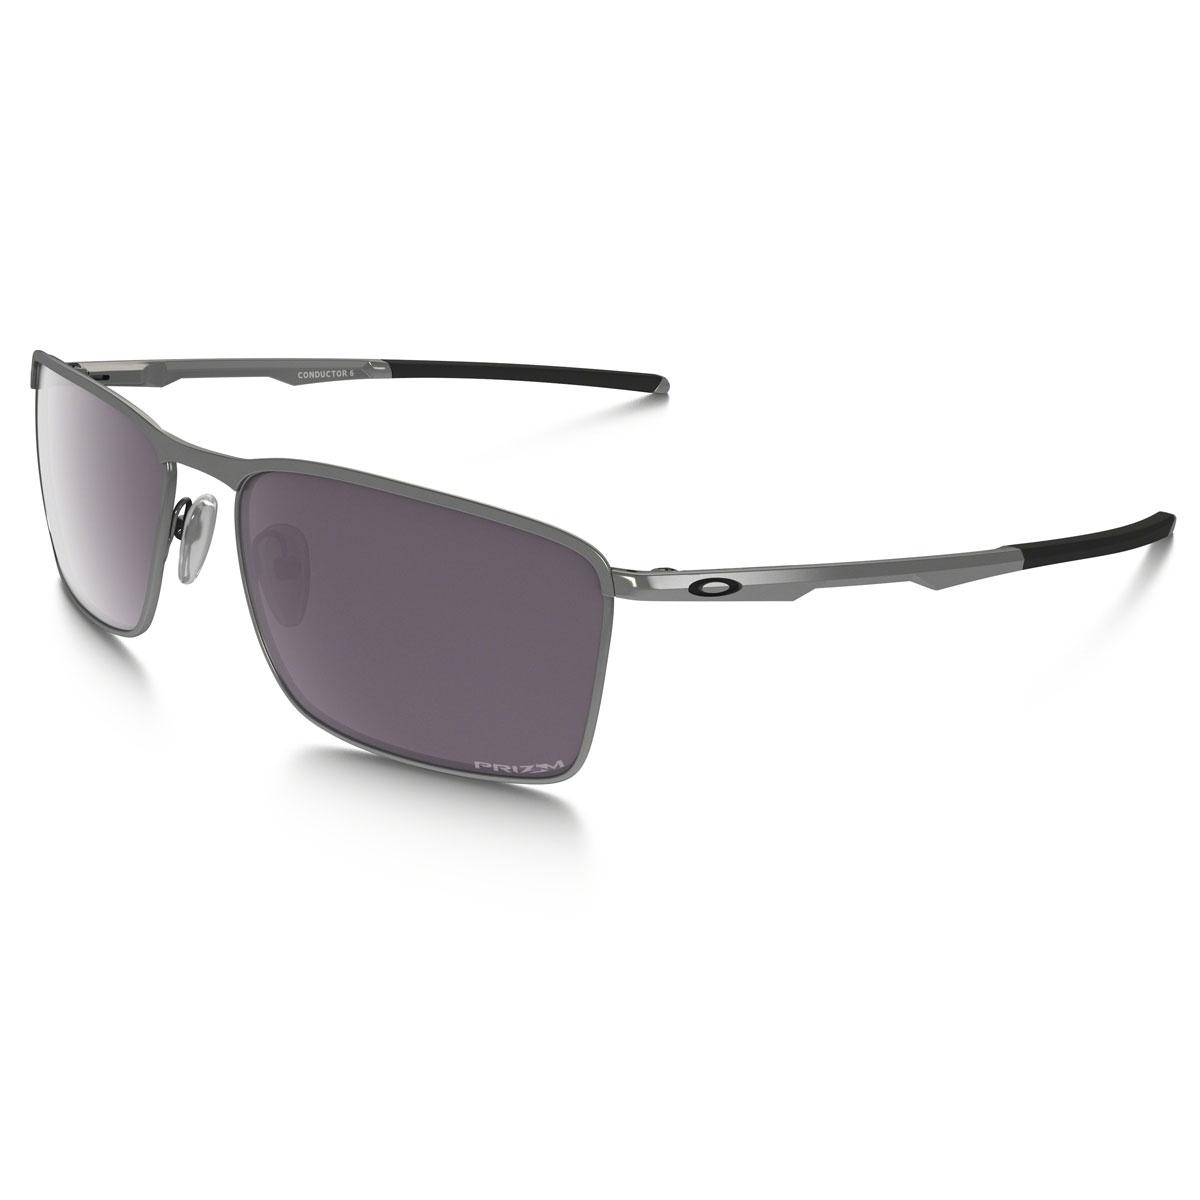 a763976a6e4 Image of Oakley Conductor 6 Prizm Daily Polarized Sunglasses - Lead Frame Prizm  Daily Polarized